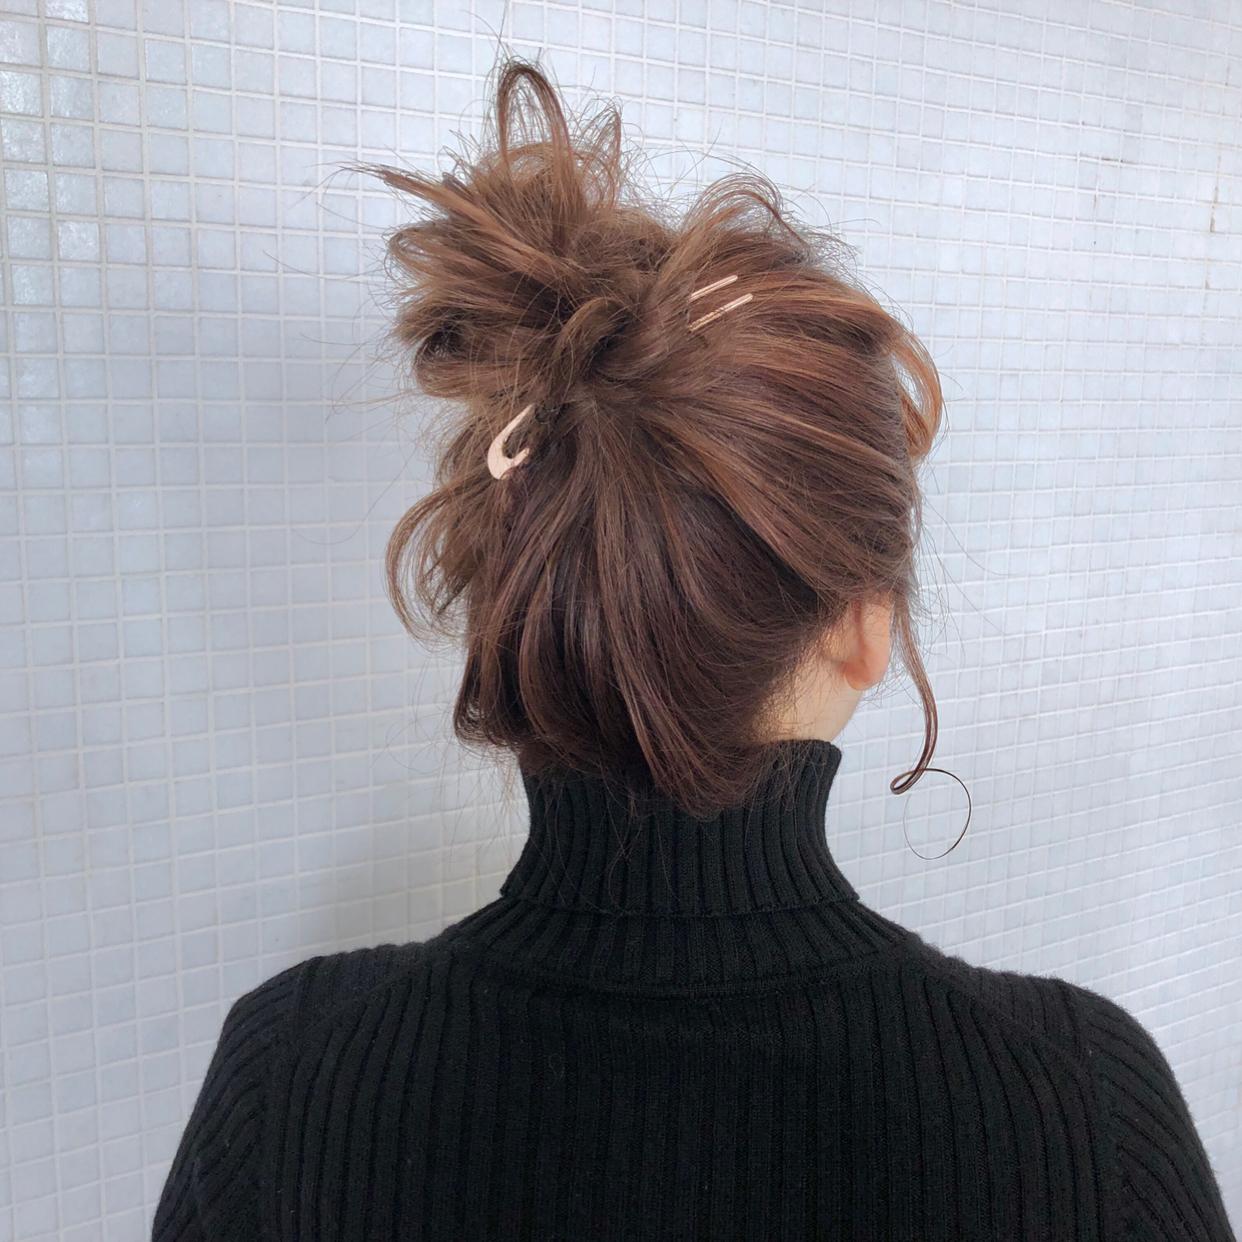 kawamura_takashi_cam 最少アイテムで作るお団子ヘア ヘアアレンジ&ヘアセット 河村タカシ #hairarrangecam #hairarrange #hairset #hair #ヘアアレンジ #へアセット #ヘア #関西 #大阪 #心斎橋 #hairdresser #美容師 #サロンモデル募集 #サロモ #おくれ毛 #簡単ヘアアレンジ